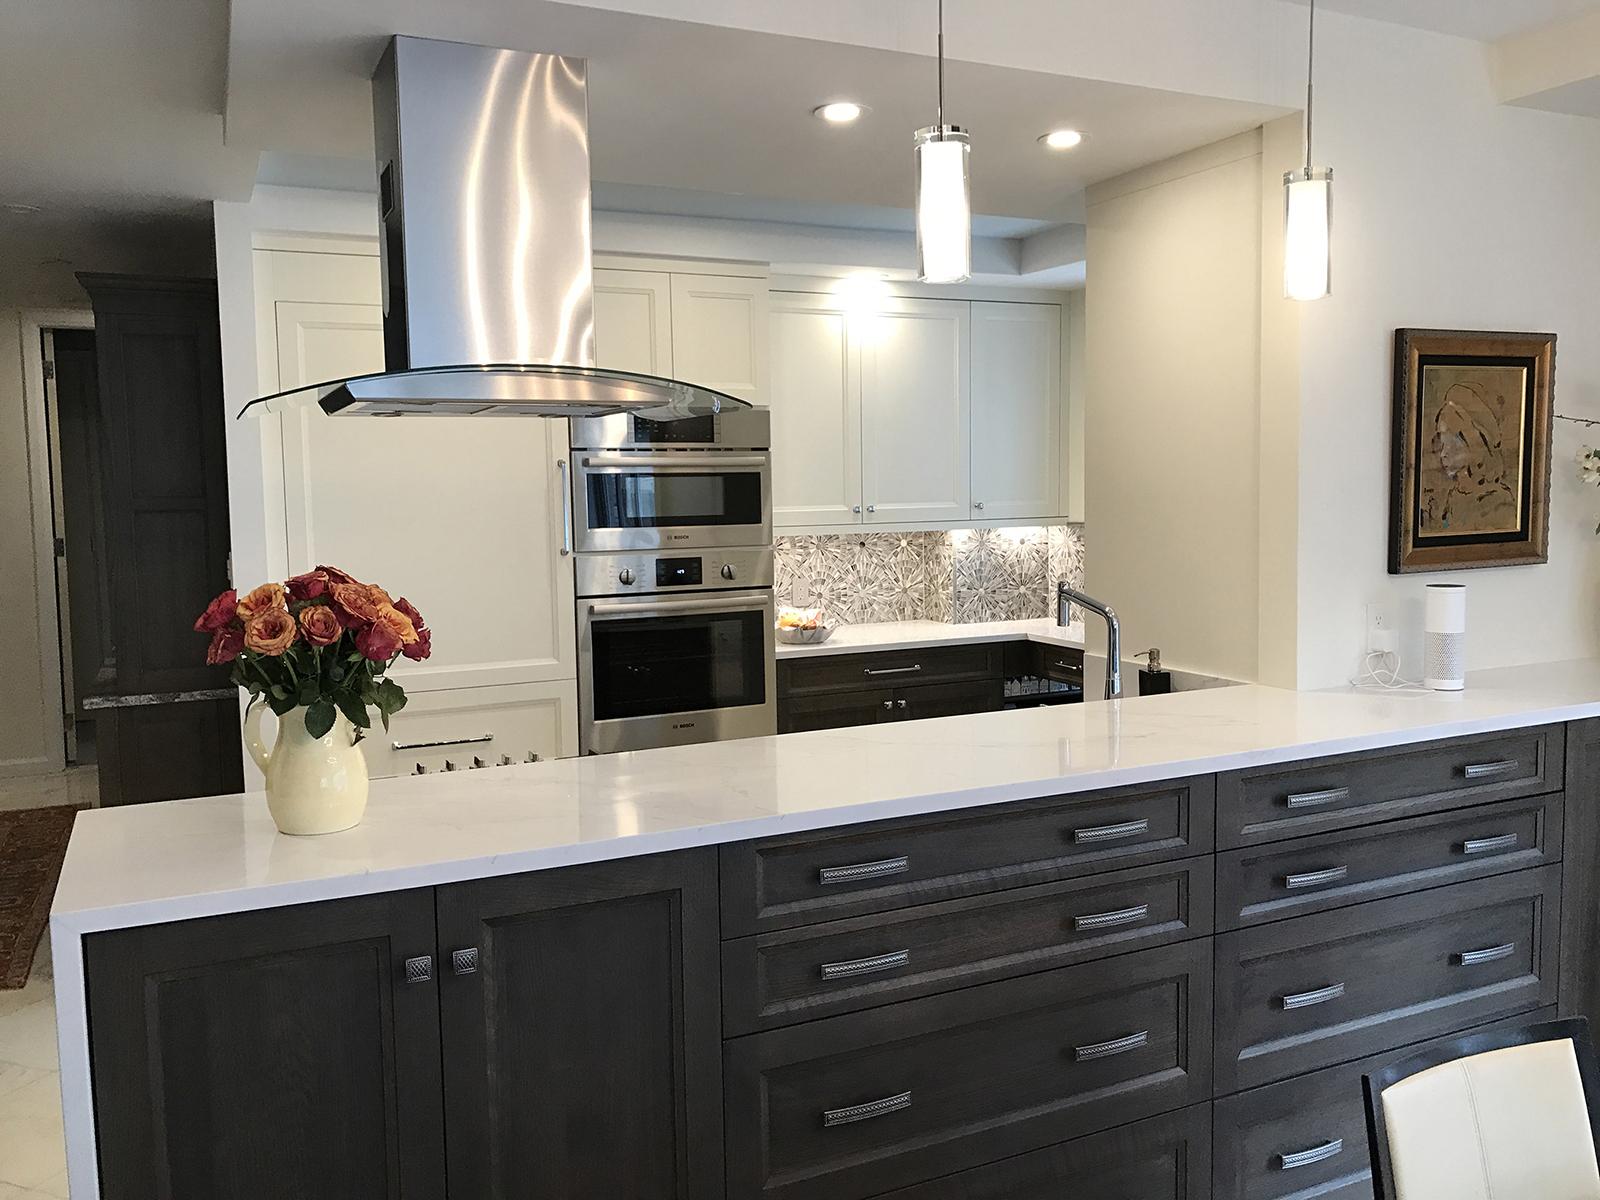 Manhattan Apartment Renovation Opens Up Kitcvhen to Gorgeous Manhattan View